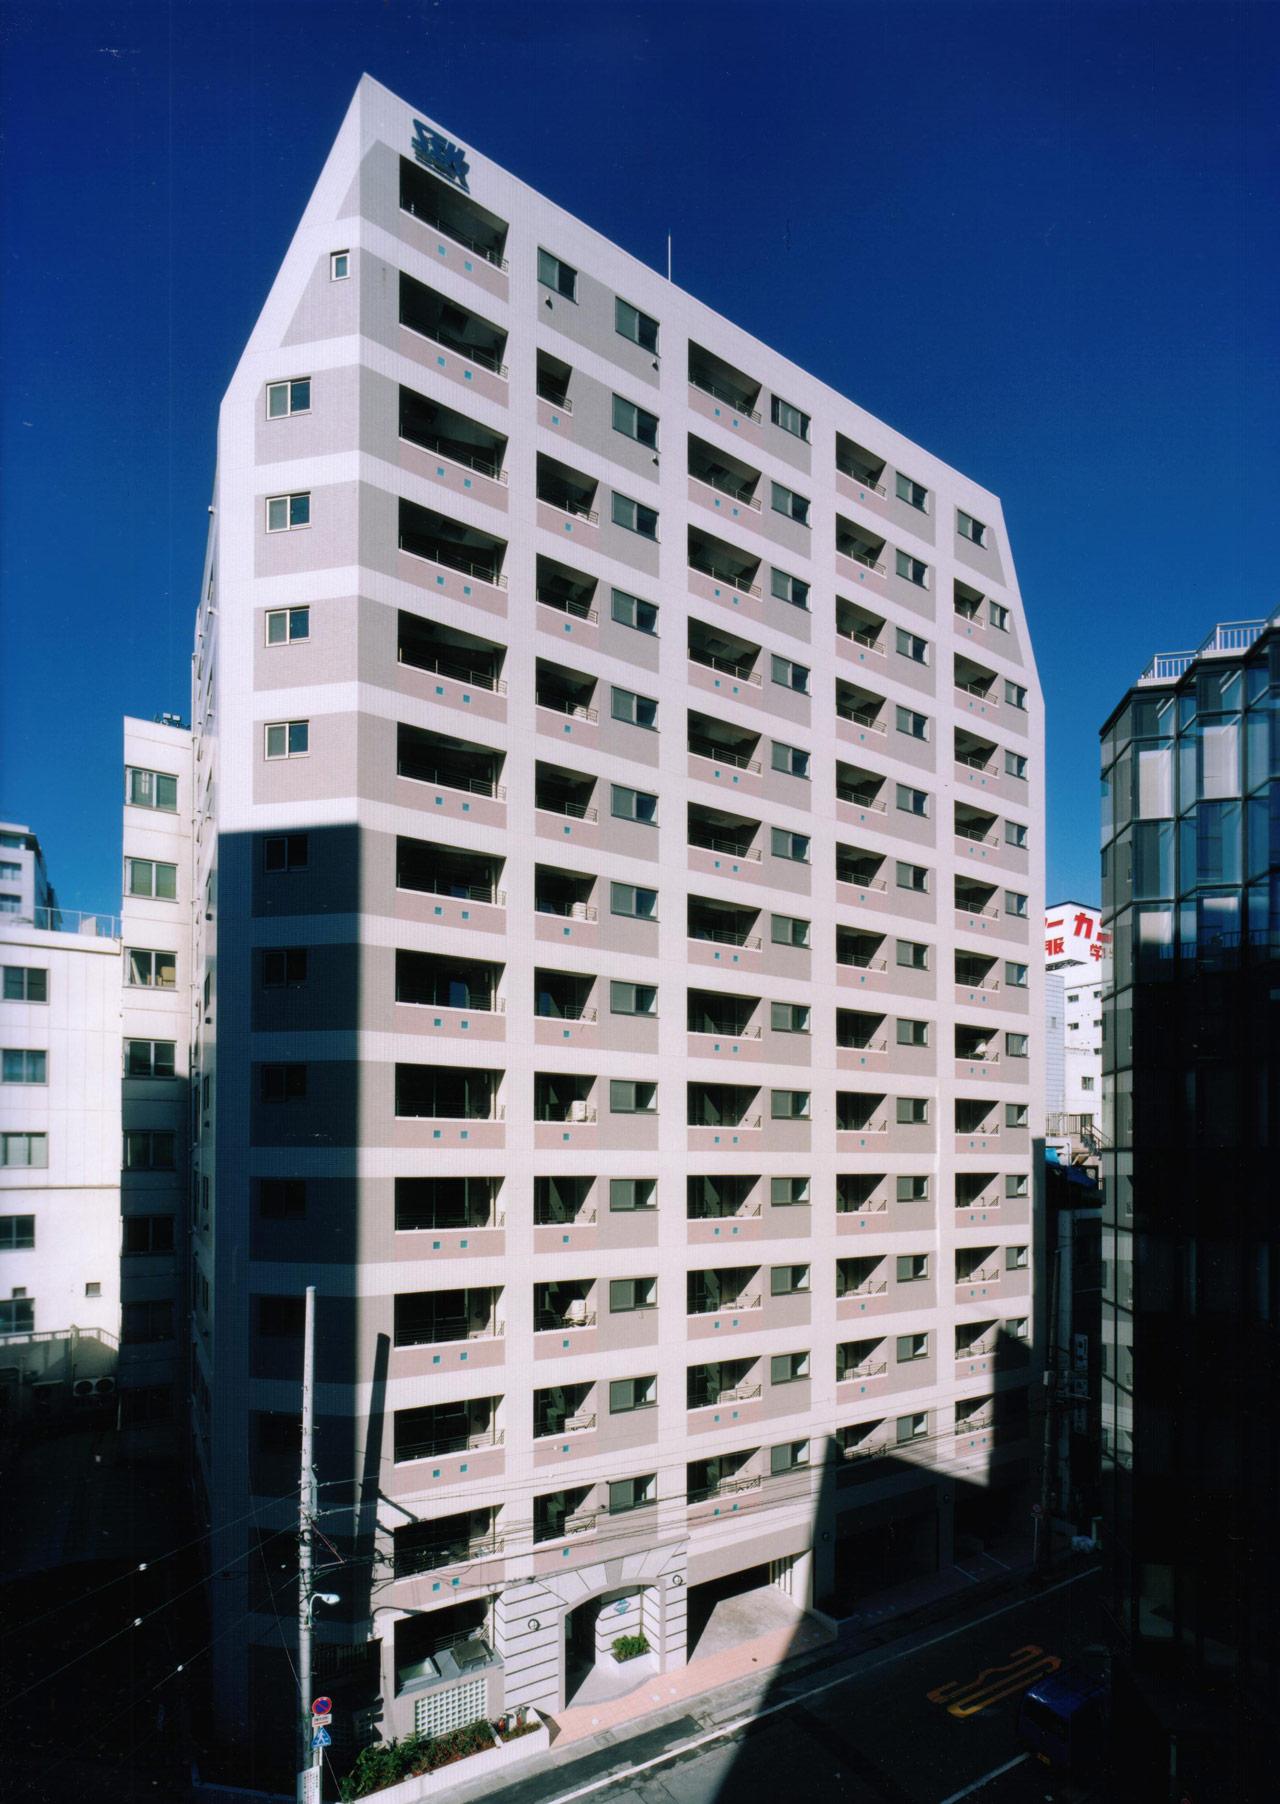 GREEN PARK 東日本橋 | マンションギャラリー